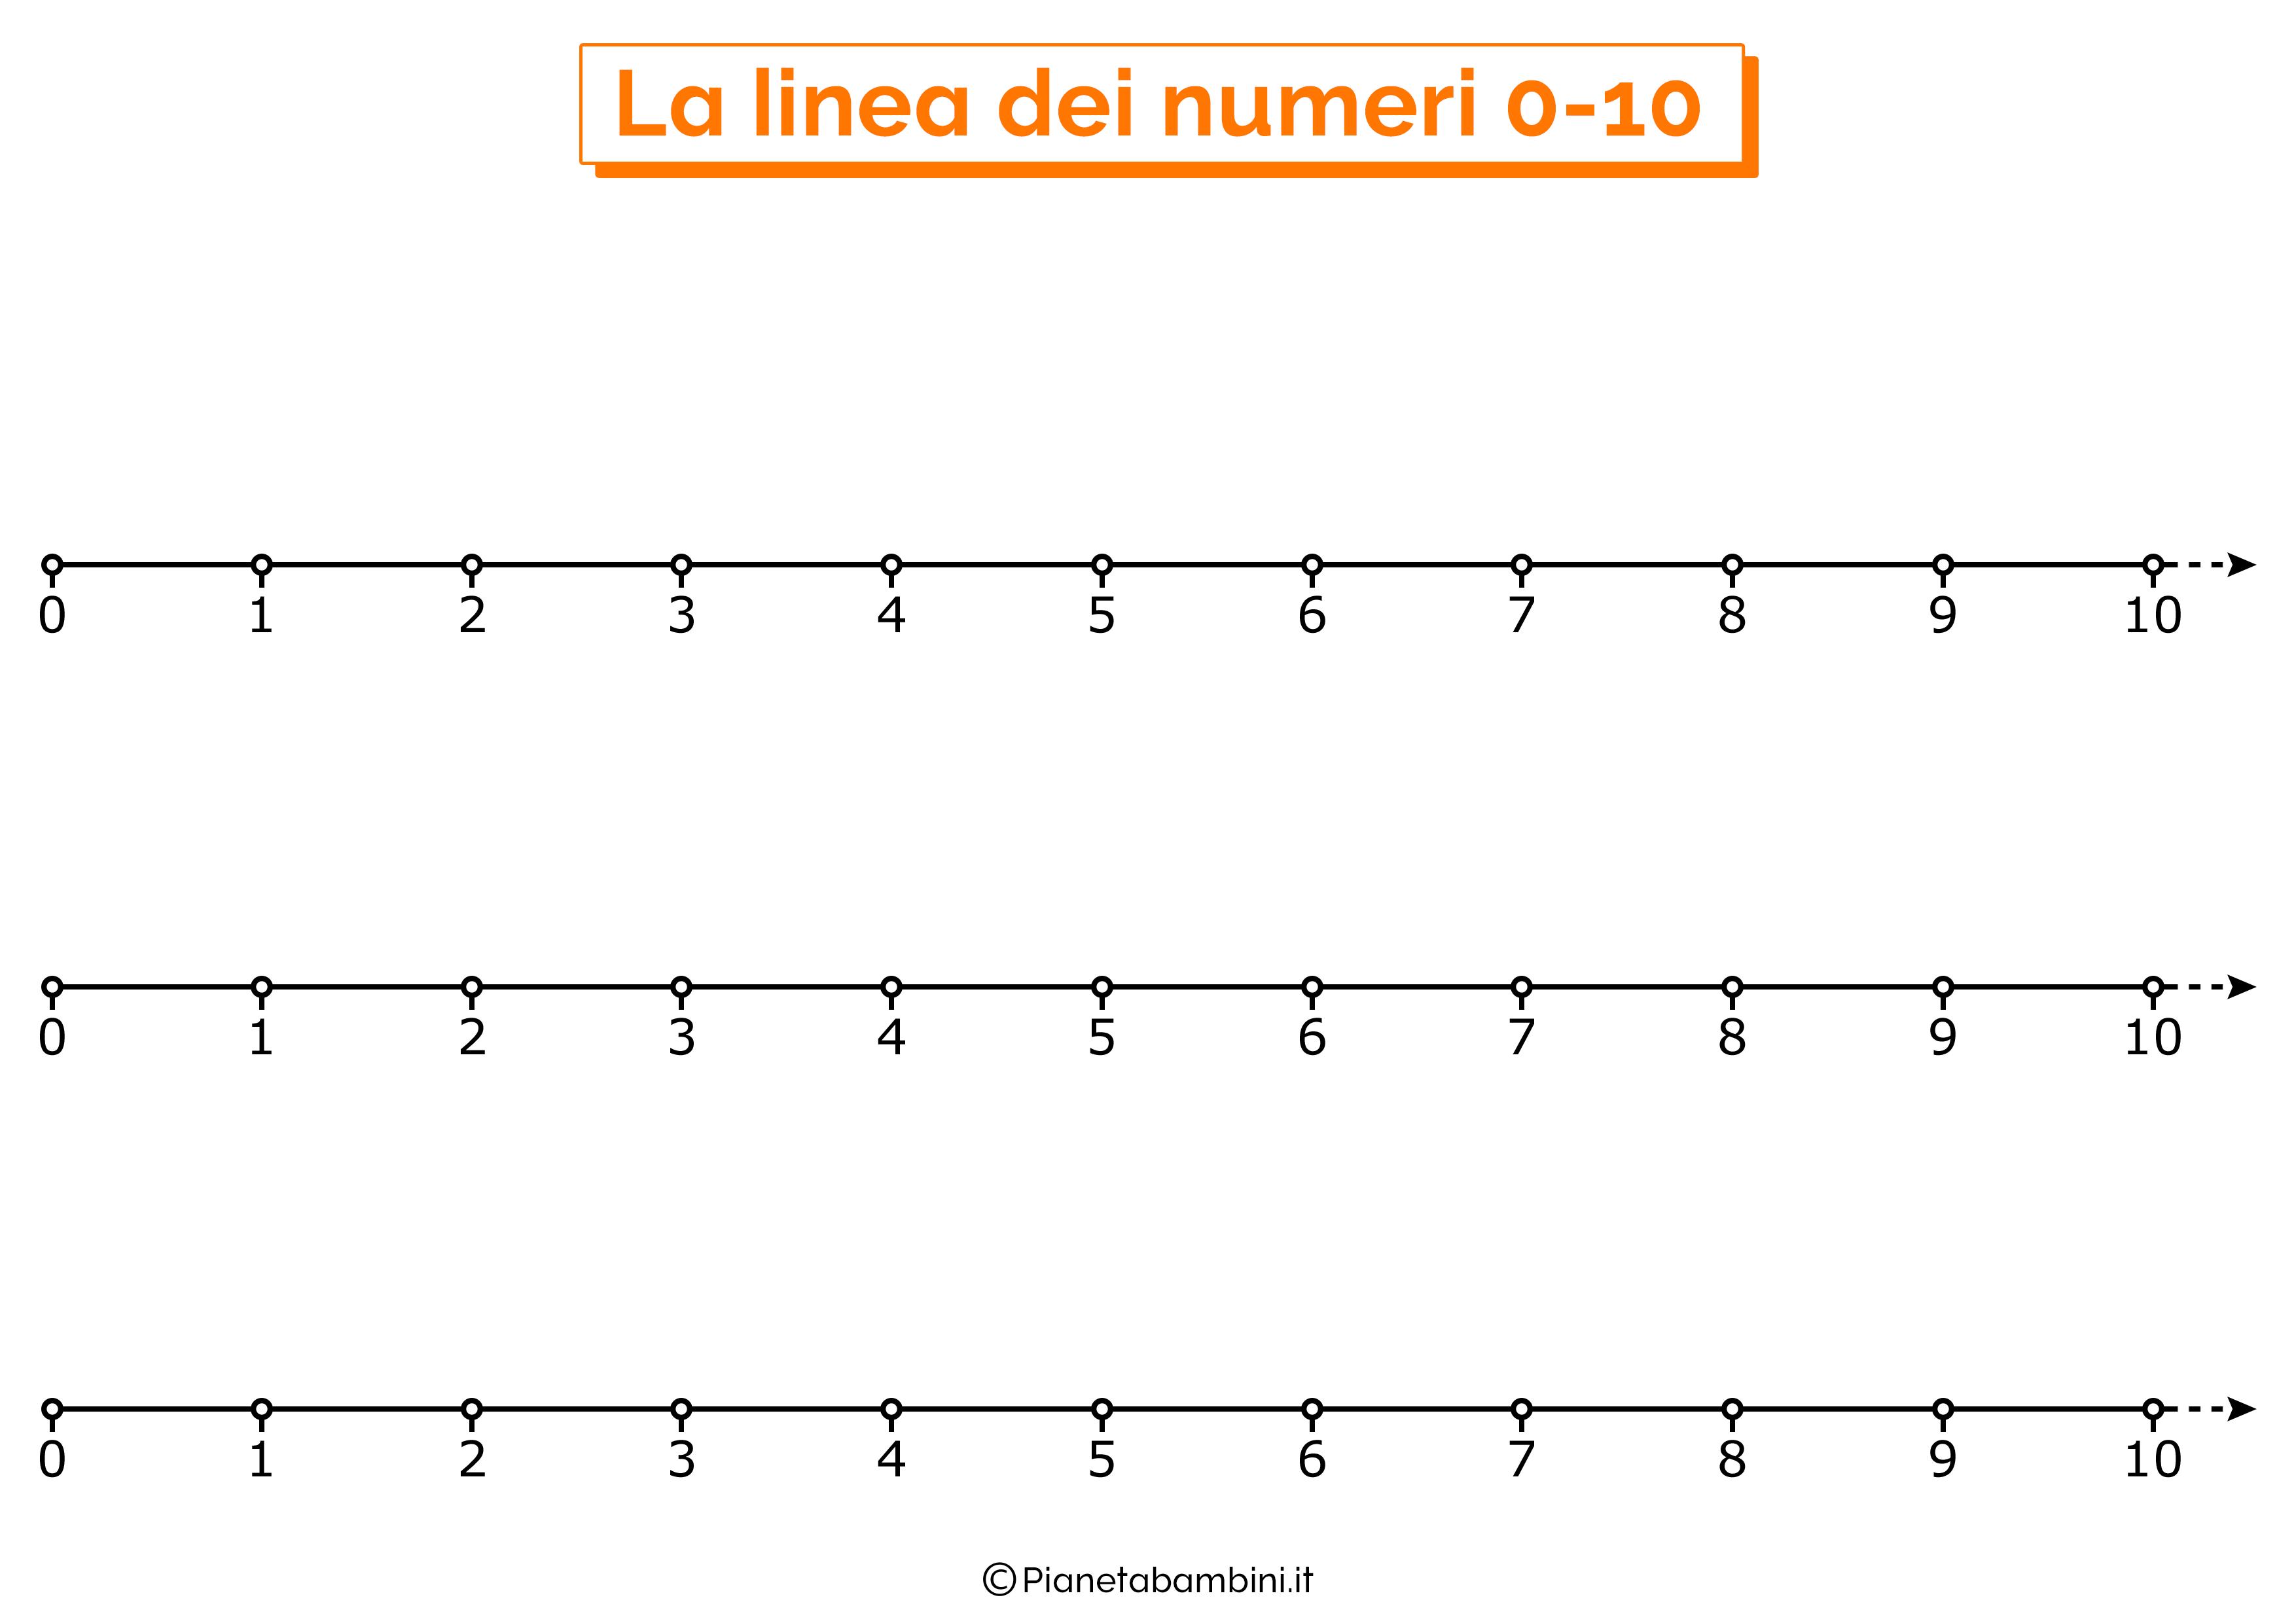 Linea dei numeri 0-10